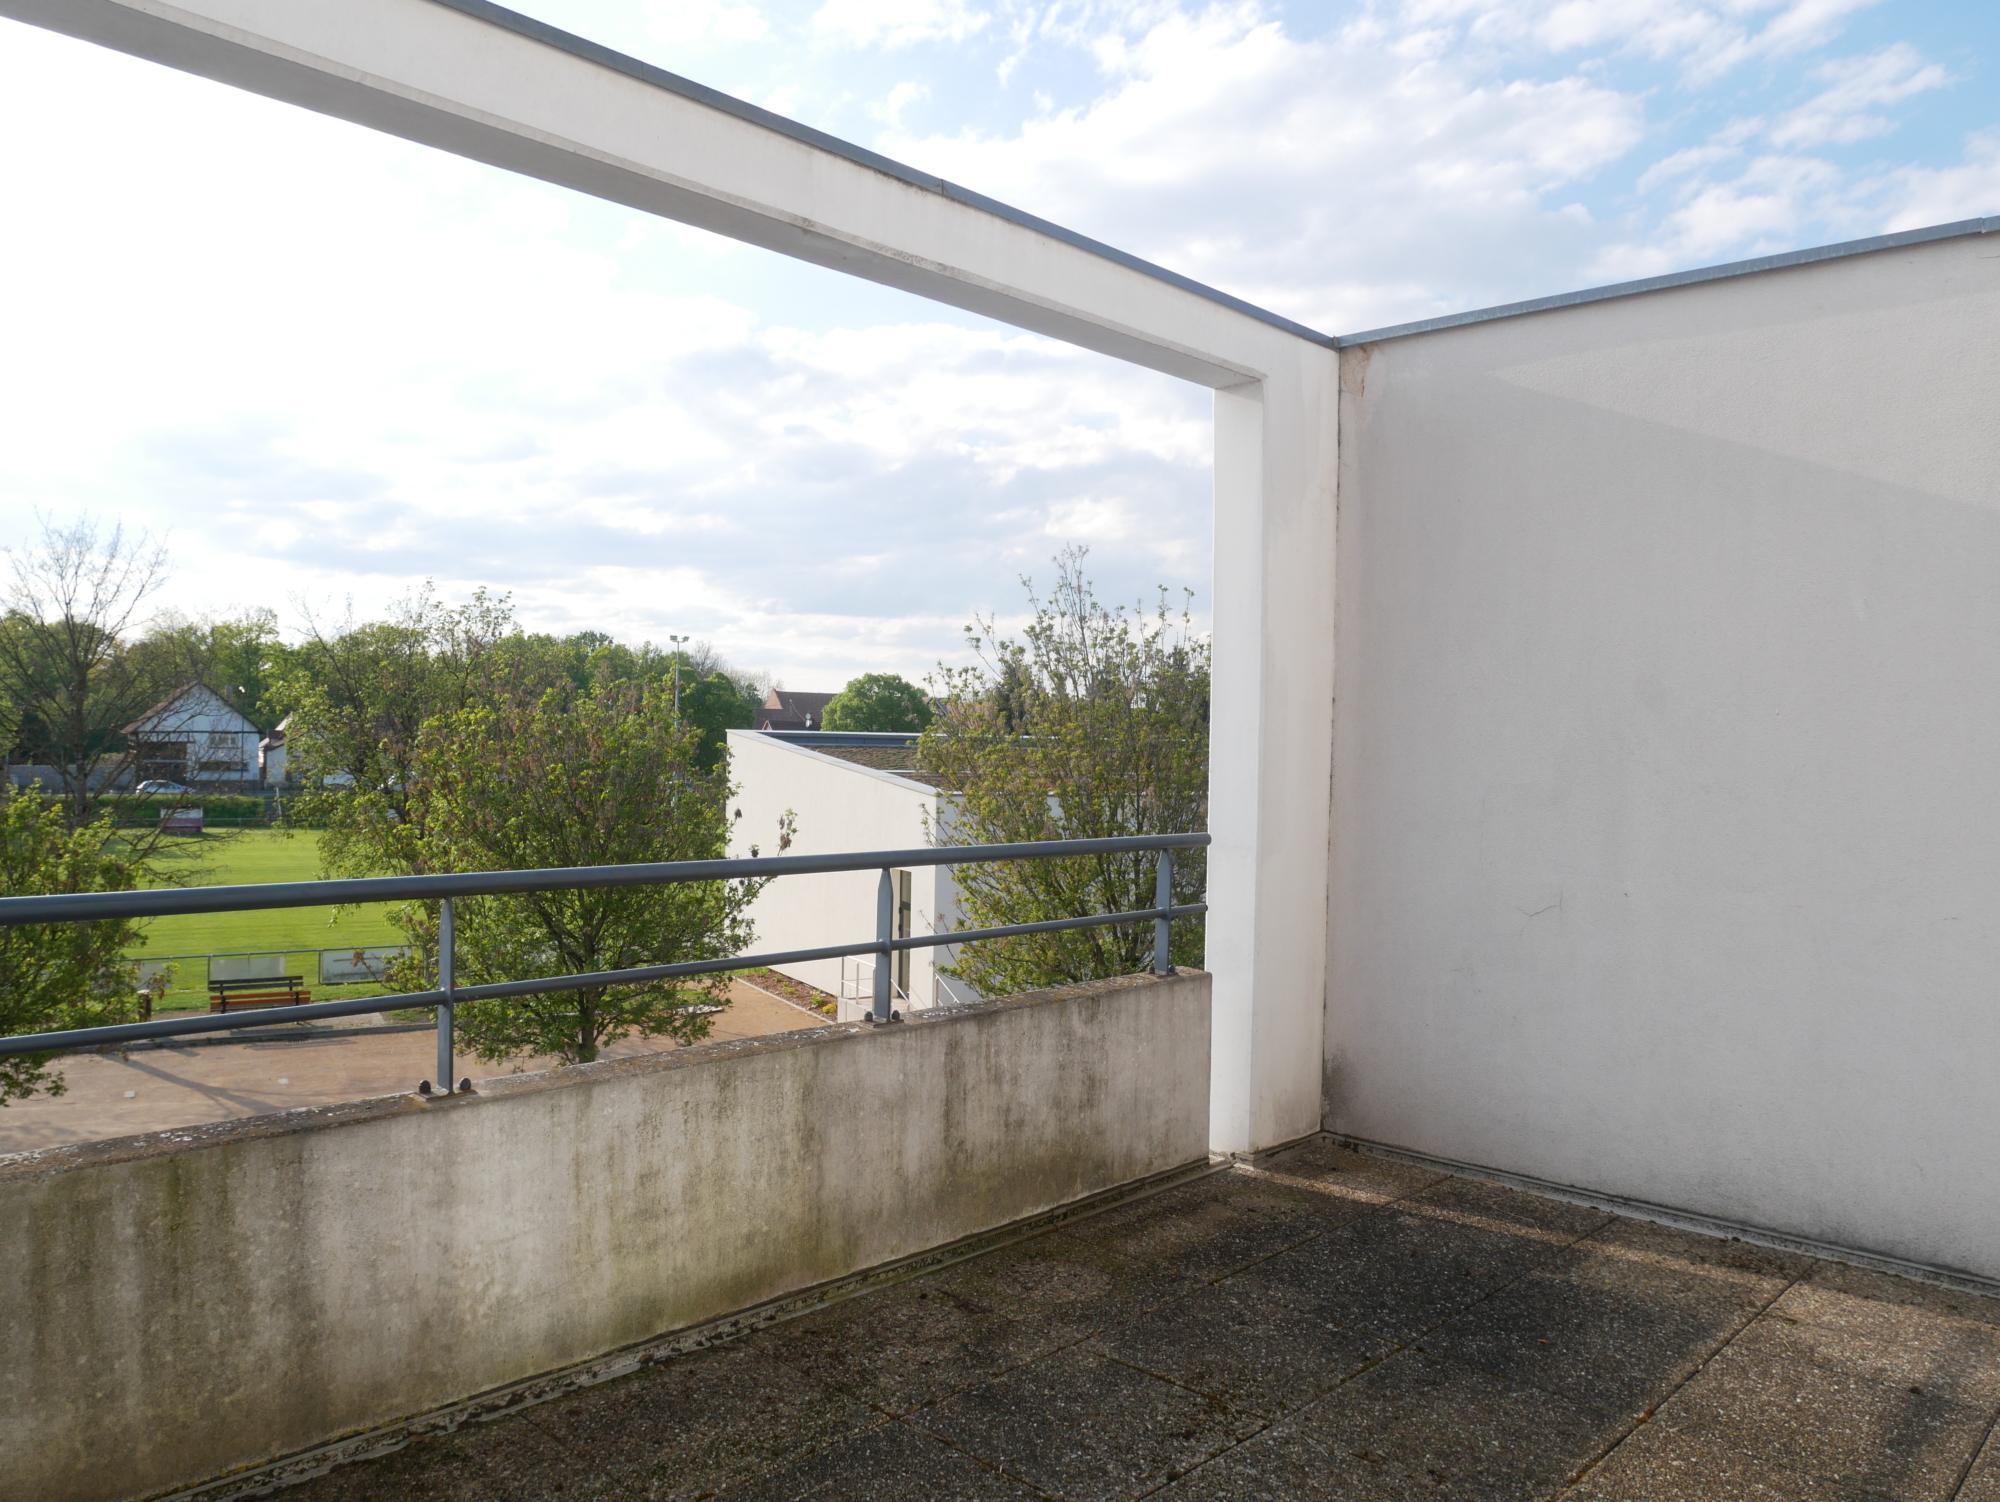 [Nature] Lumineux 3 pièces avec terrasse - Krafft - nos locations - Beausite Immobilier 2